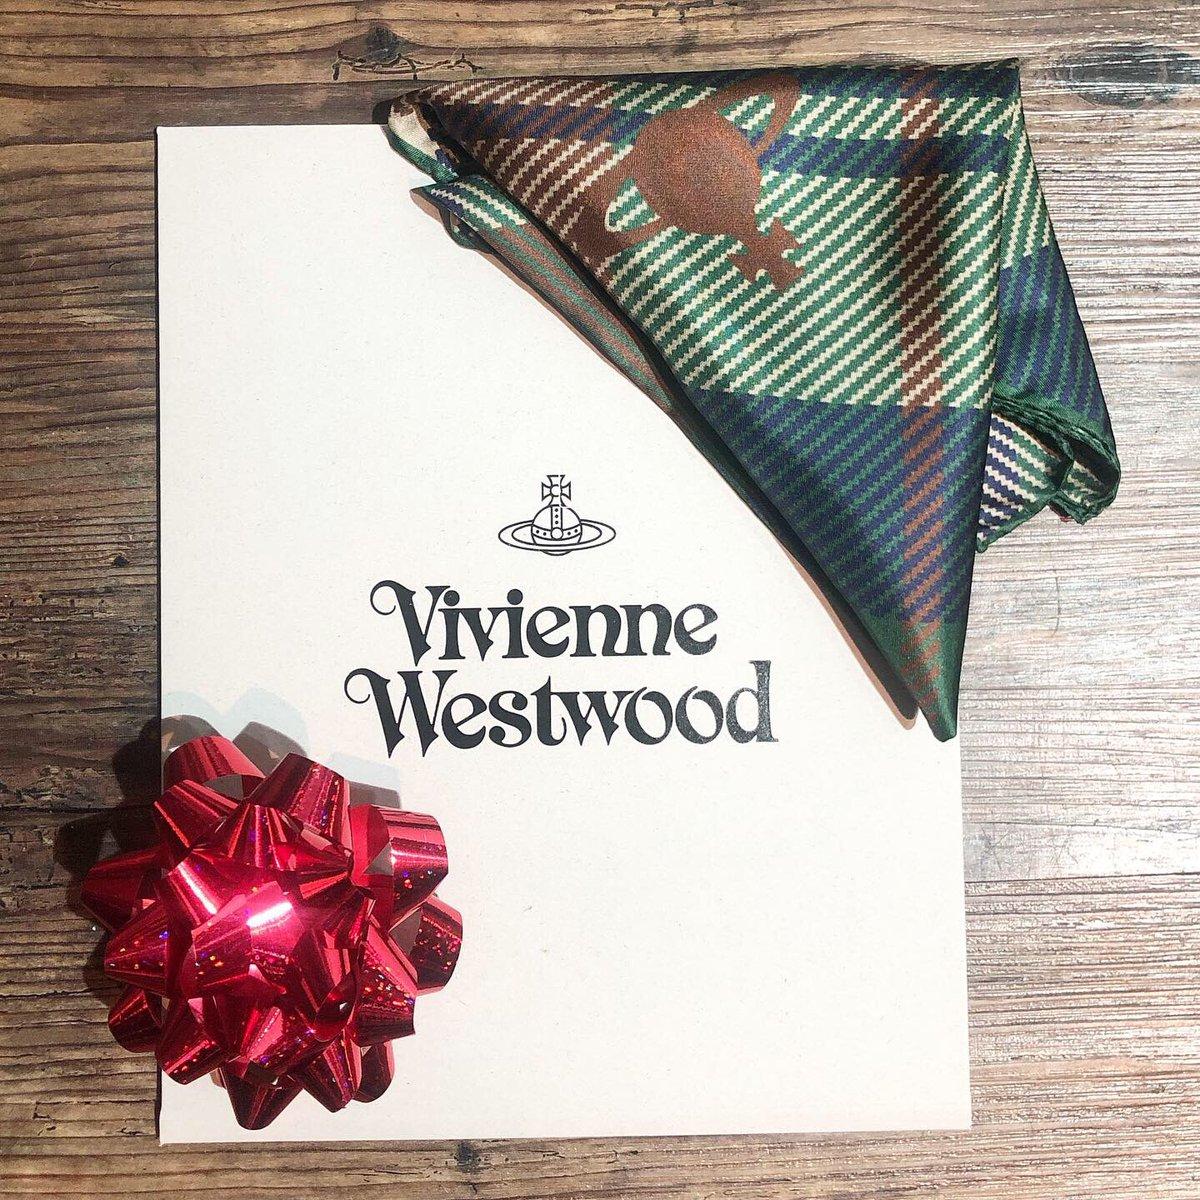 Give a #gift of luxury this Xmas % SILK TWILL #pocketsquare/ #handkerchief by @viviennewestwood  #mens #mensfashion #mensstyle #christmas #xmas #gifts #giftforhim #hatshop #hatshopping #GreatWesternArcade #birmingham #silk #ties #hat #hats #peakyblinders #peakyblindersstyle pic.twitter.com/EMMqE6Lp9X – at Great Western Arcade